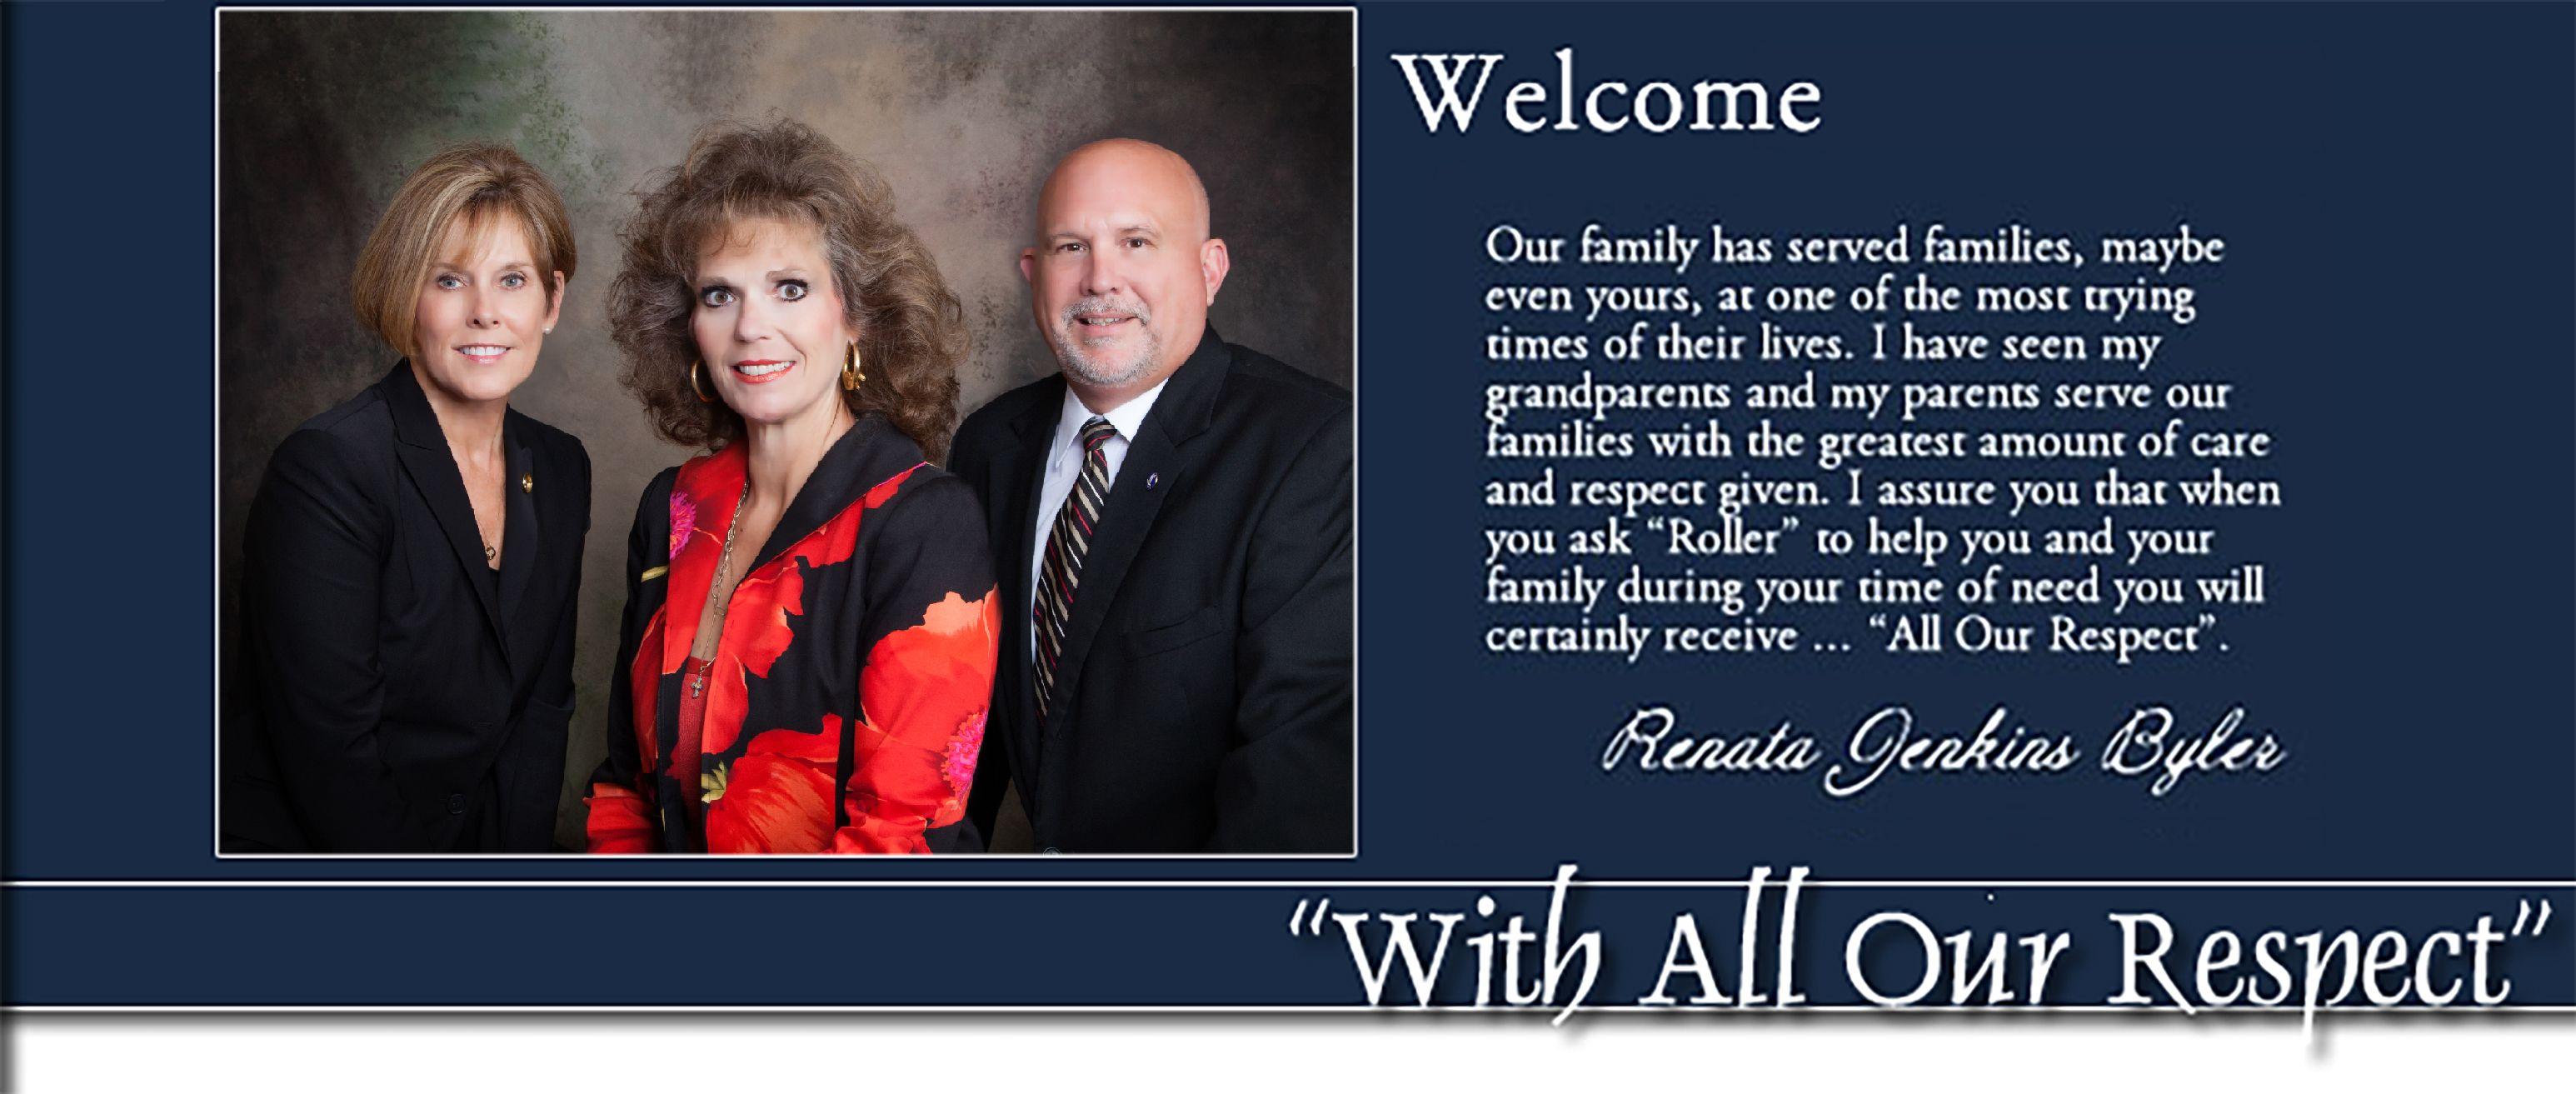 roller-ballard funeral home, benton, ar   501-315-4047